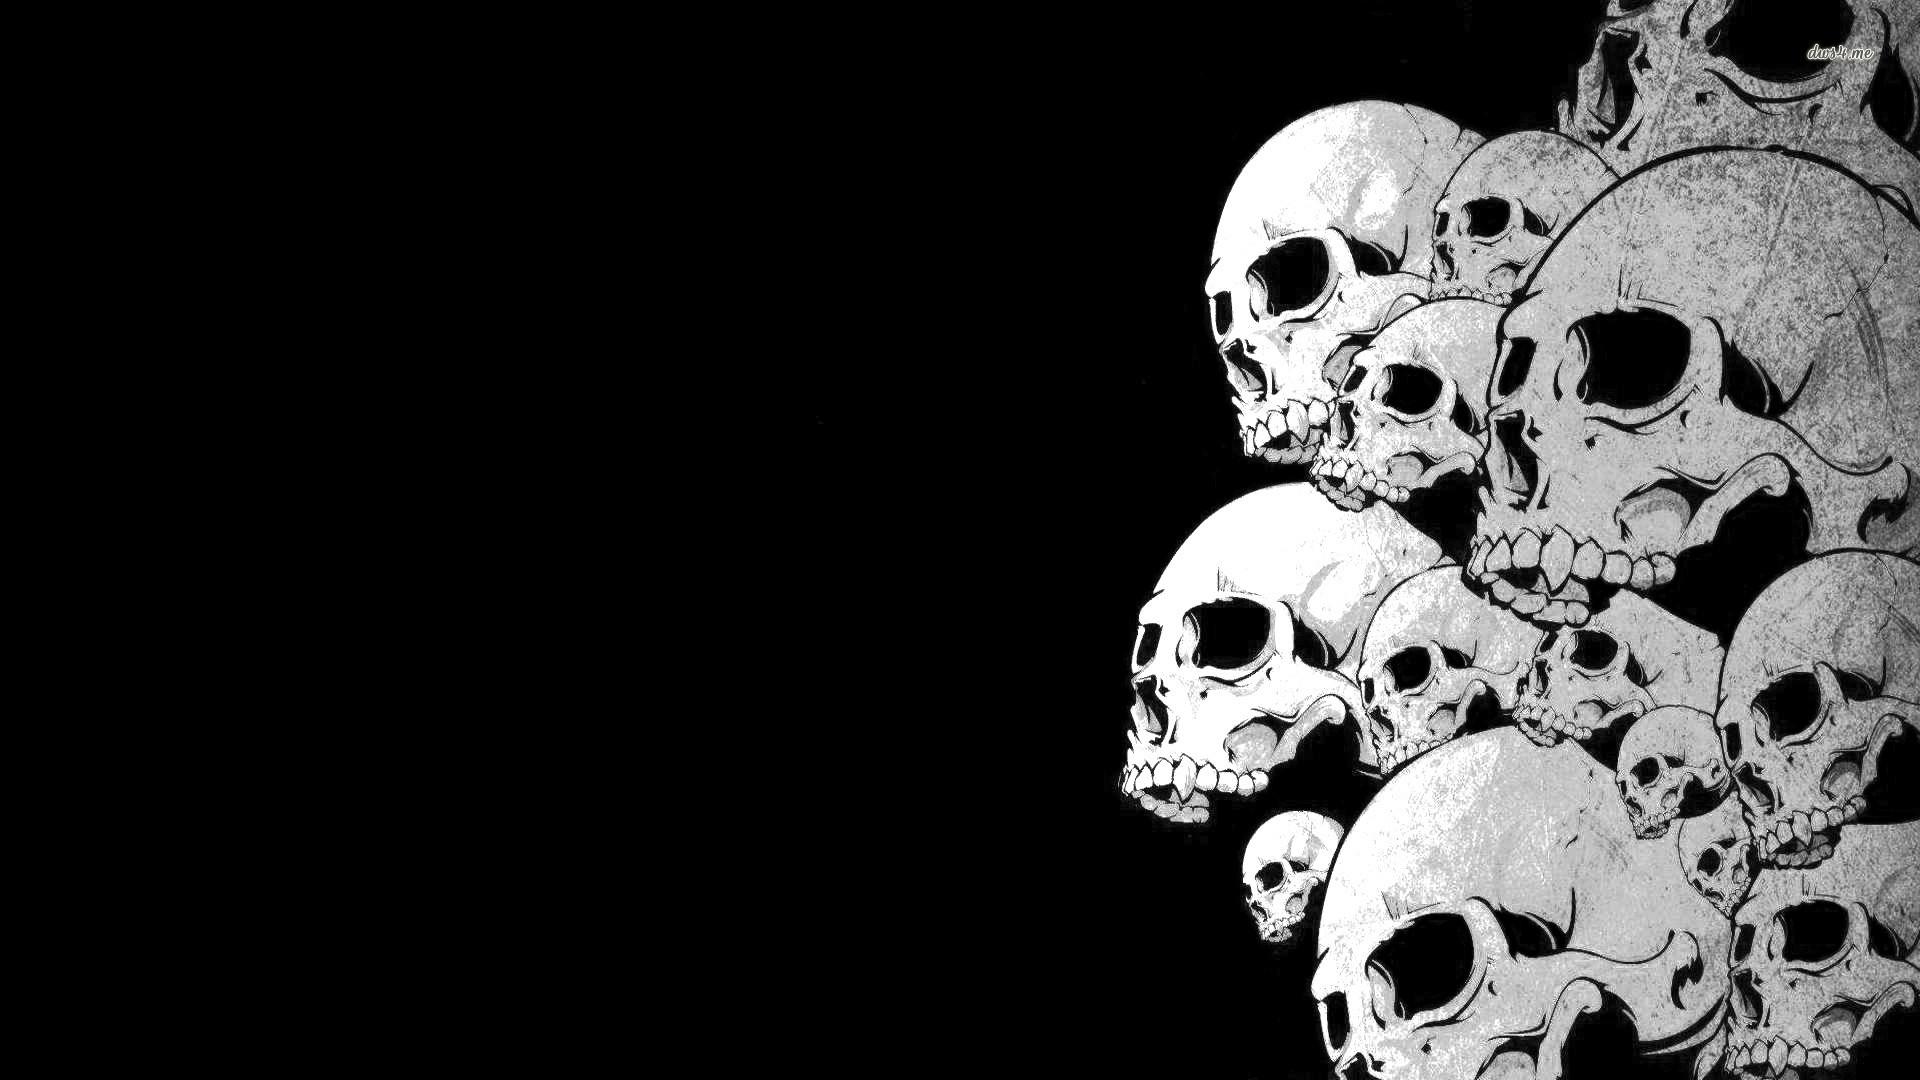 Punisher Wallpaper Full HD #XlDHd